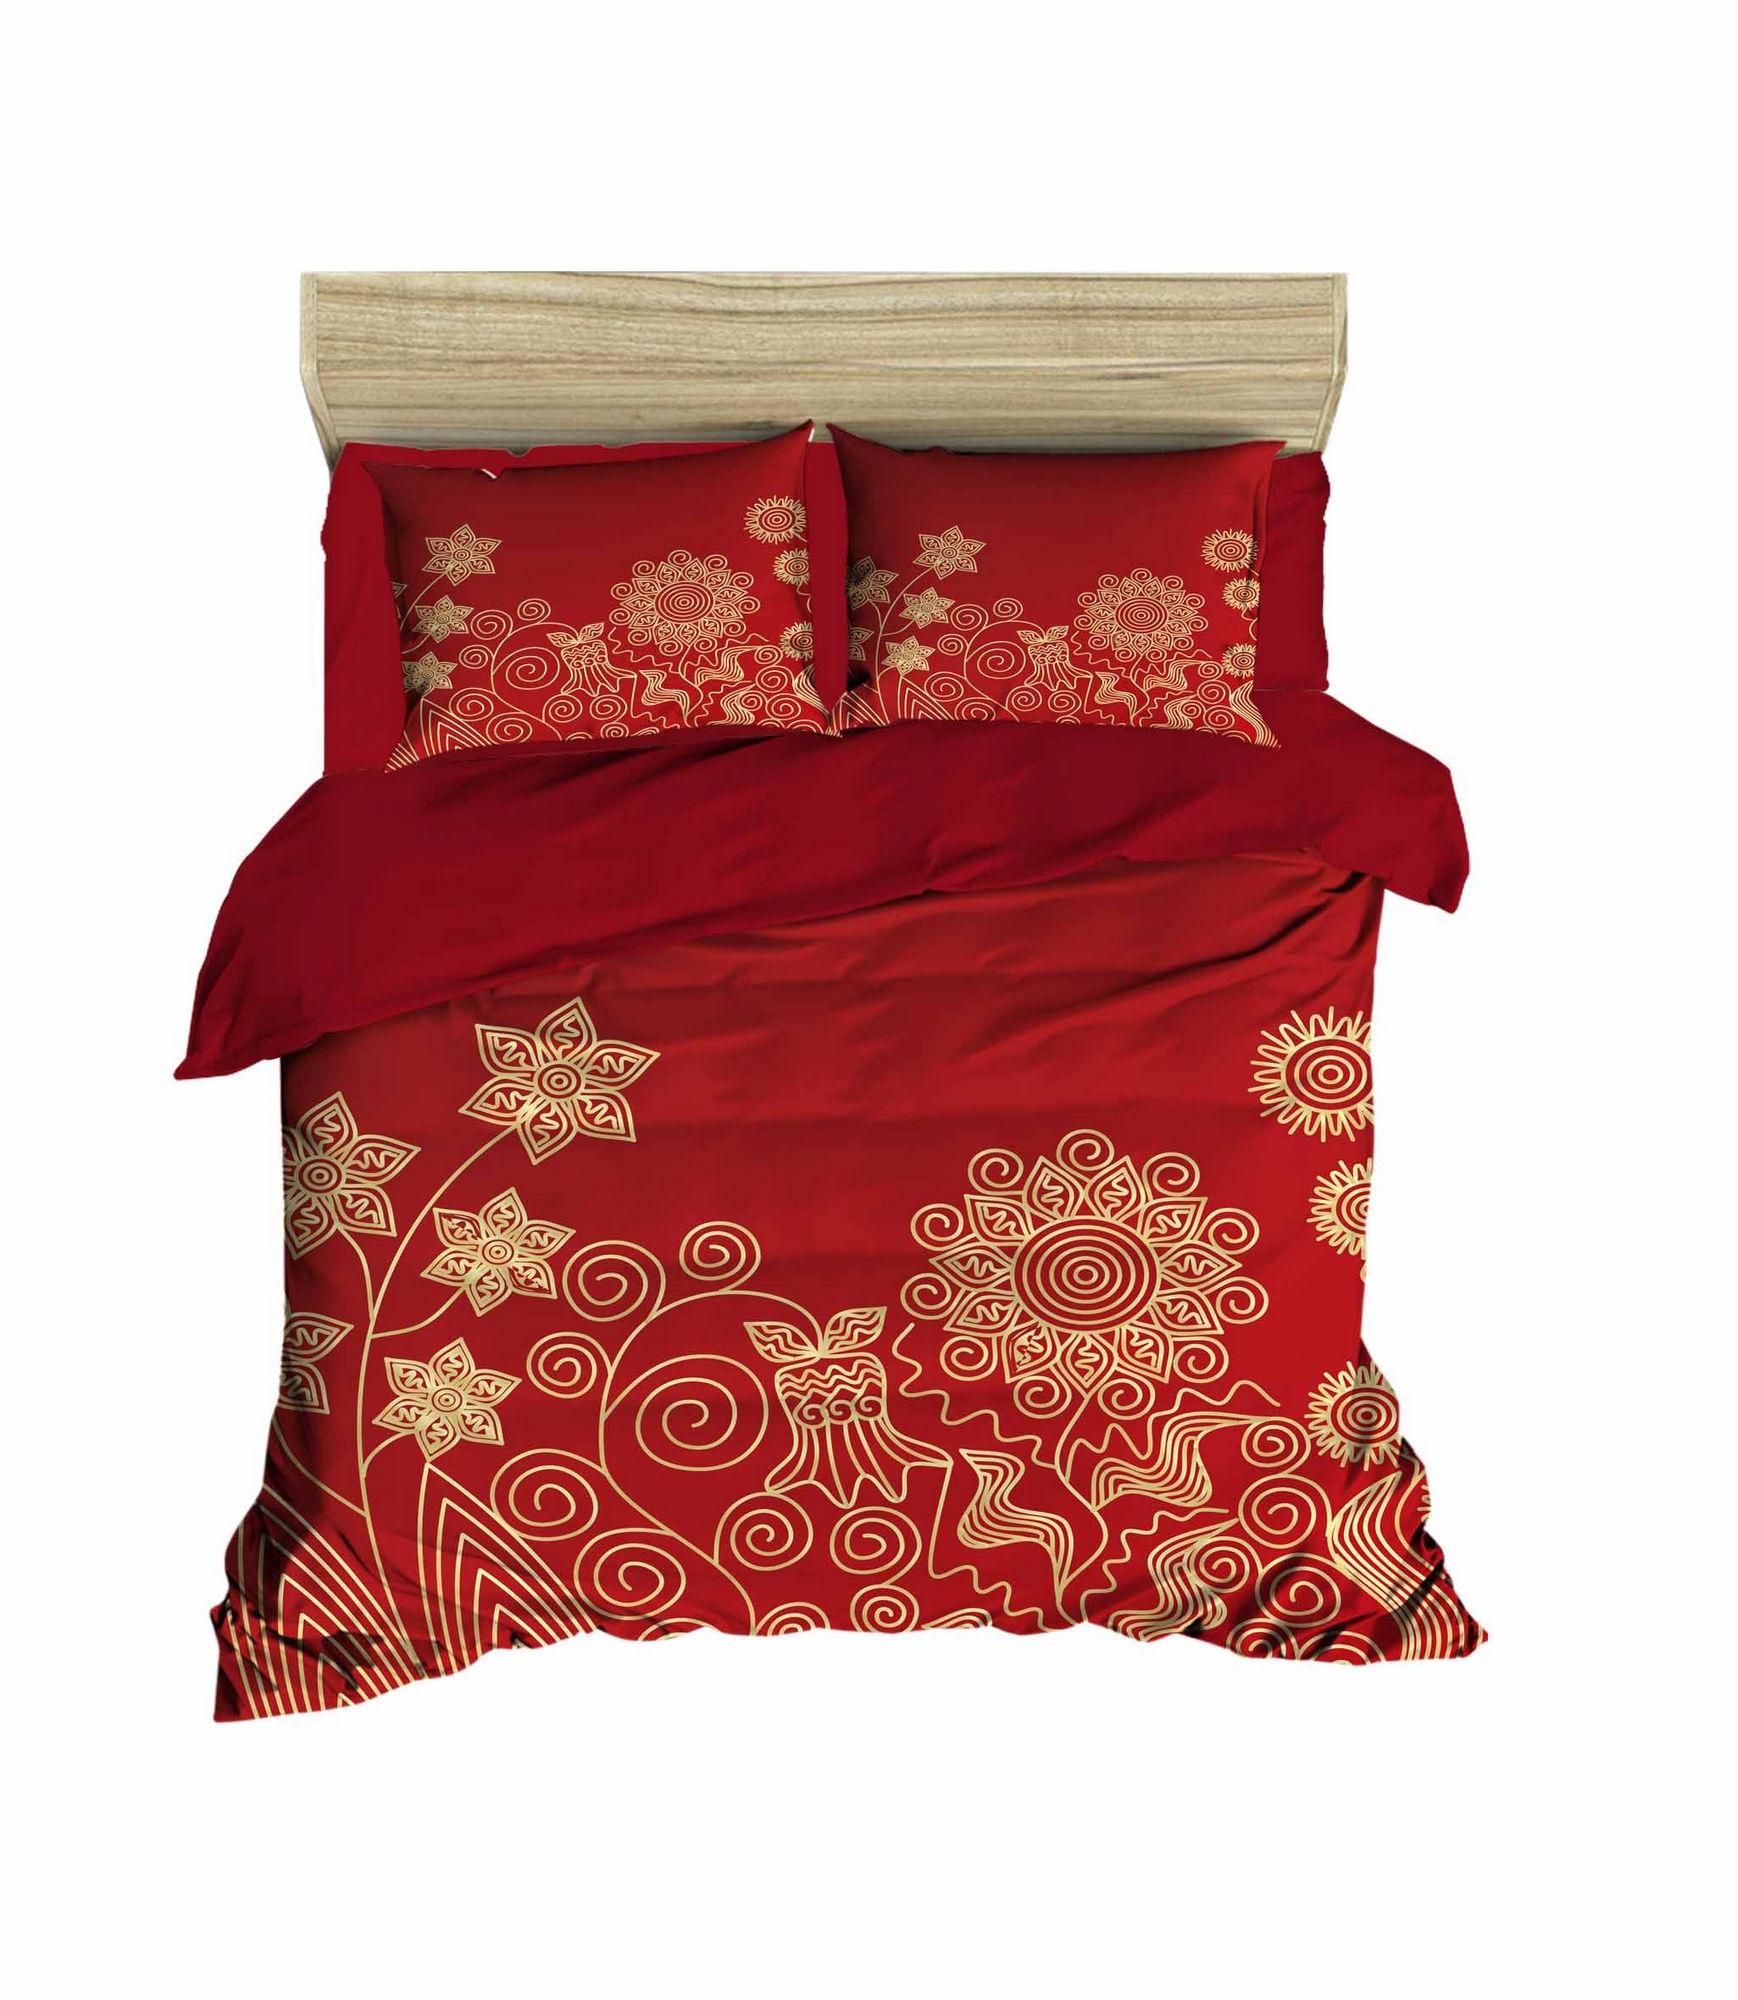 Lenjerie de pat din bumbac si microfibra Christmas 464 Rosu / Auriu, 200 x 220 cm